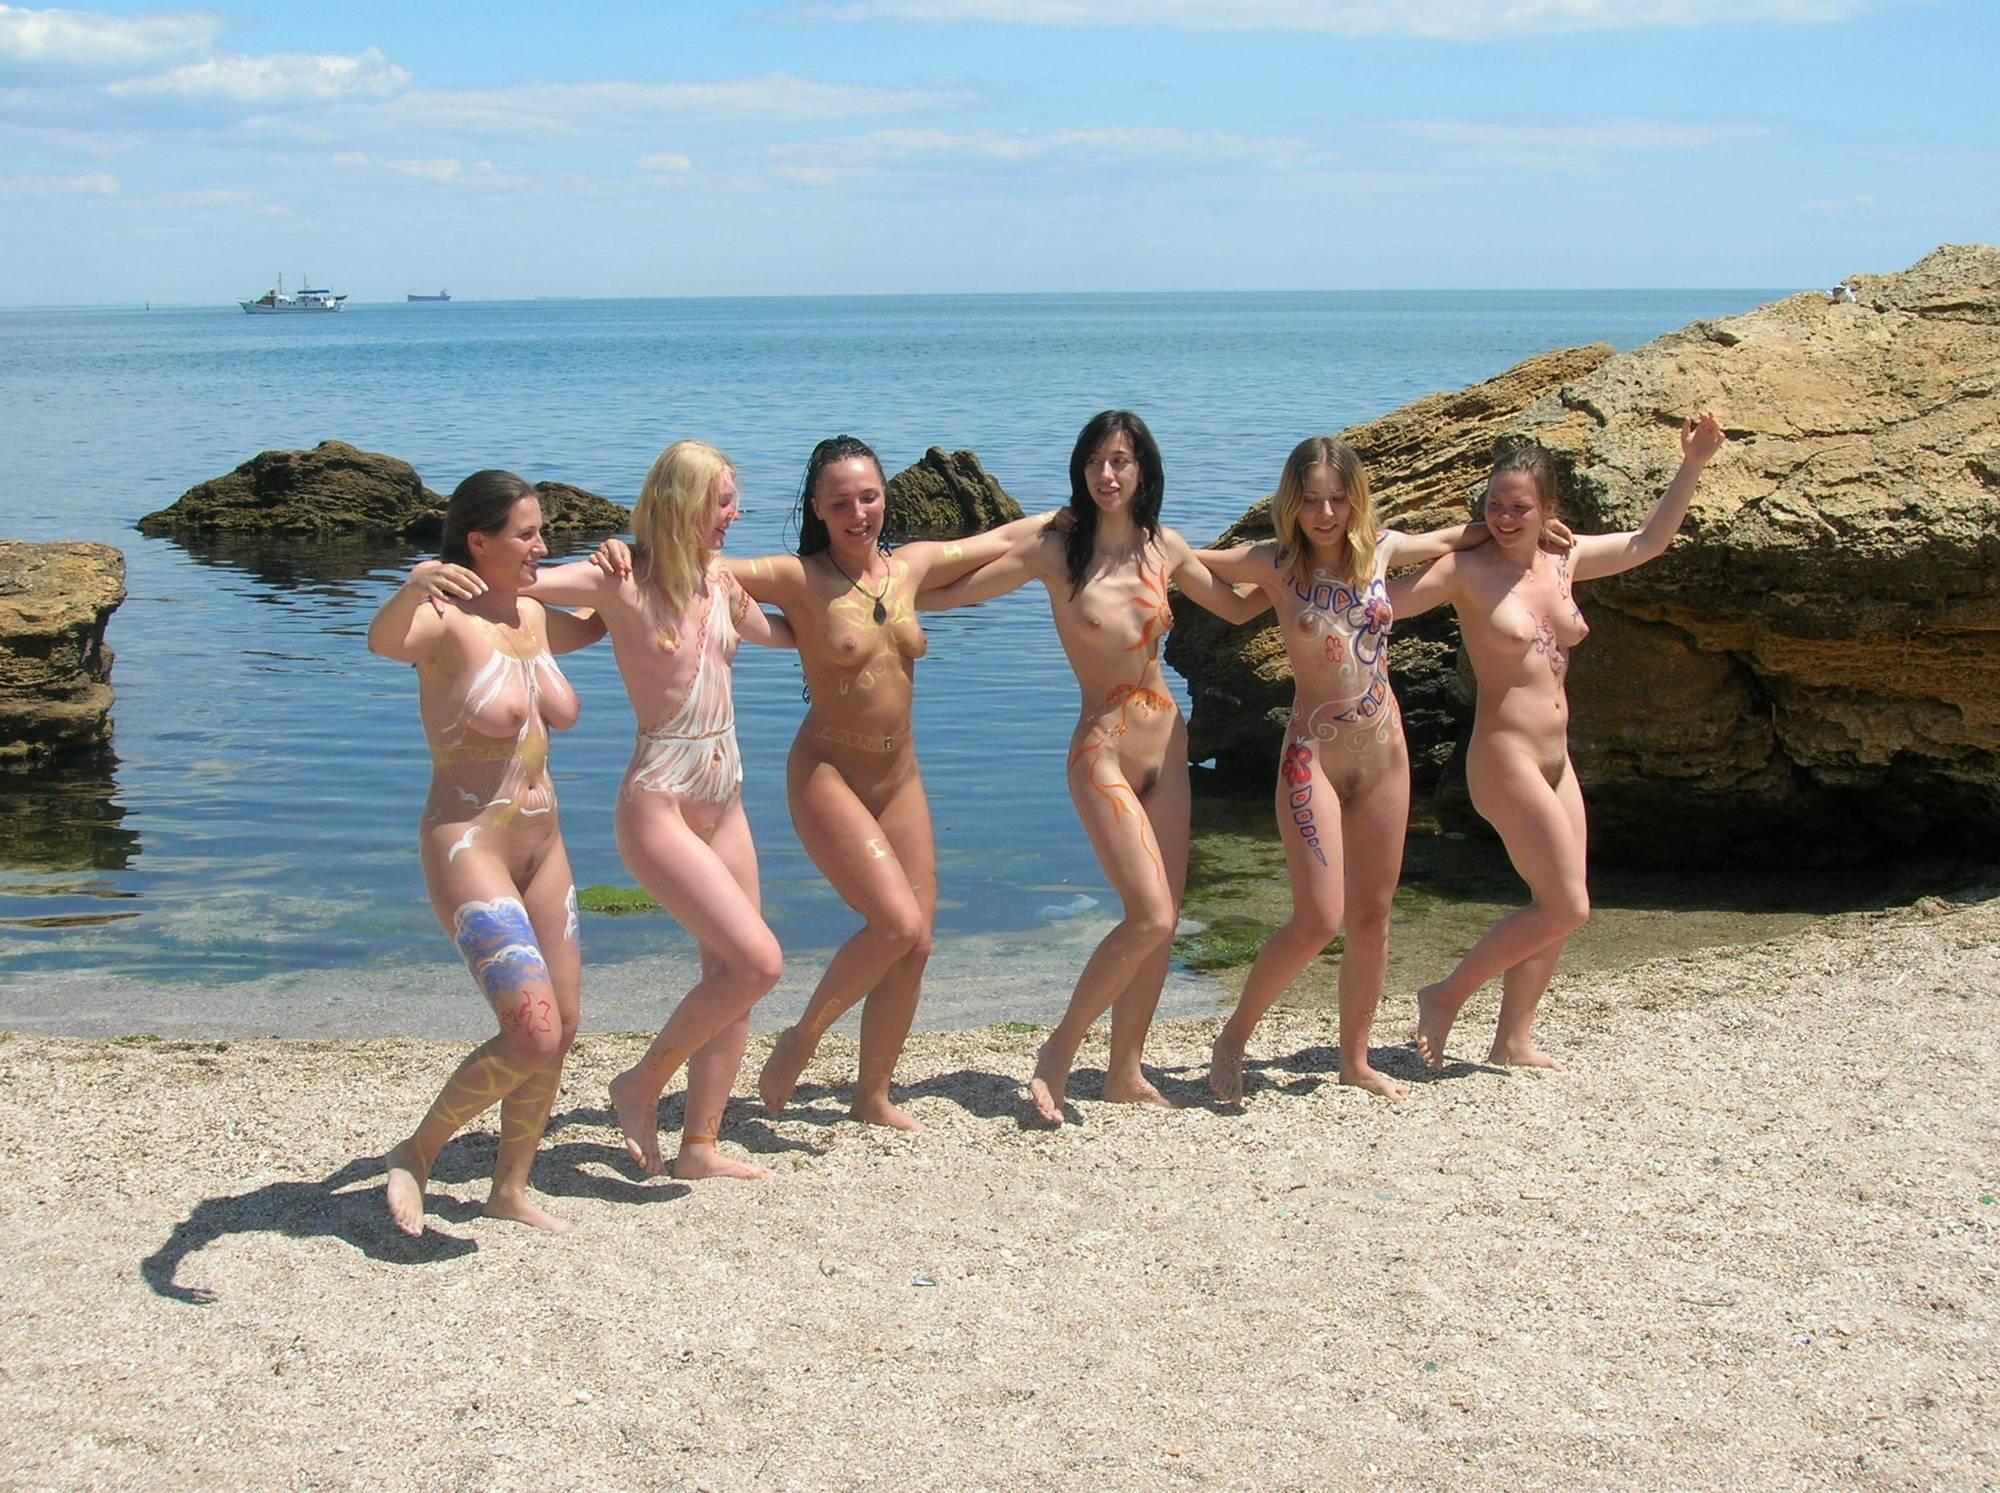 Pure Nudism-Blue Sky Beachfont Group - 2